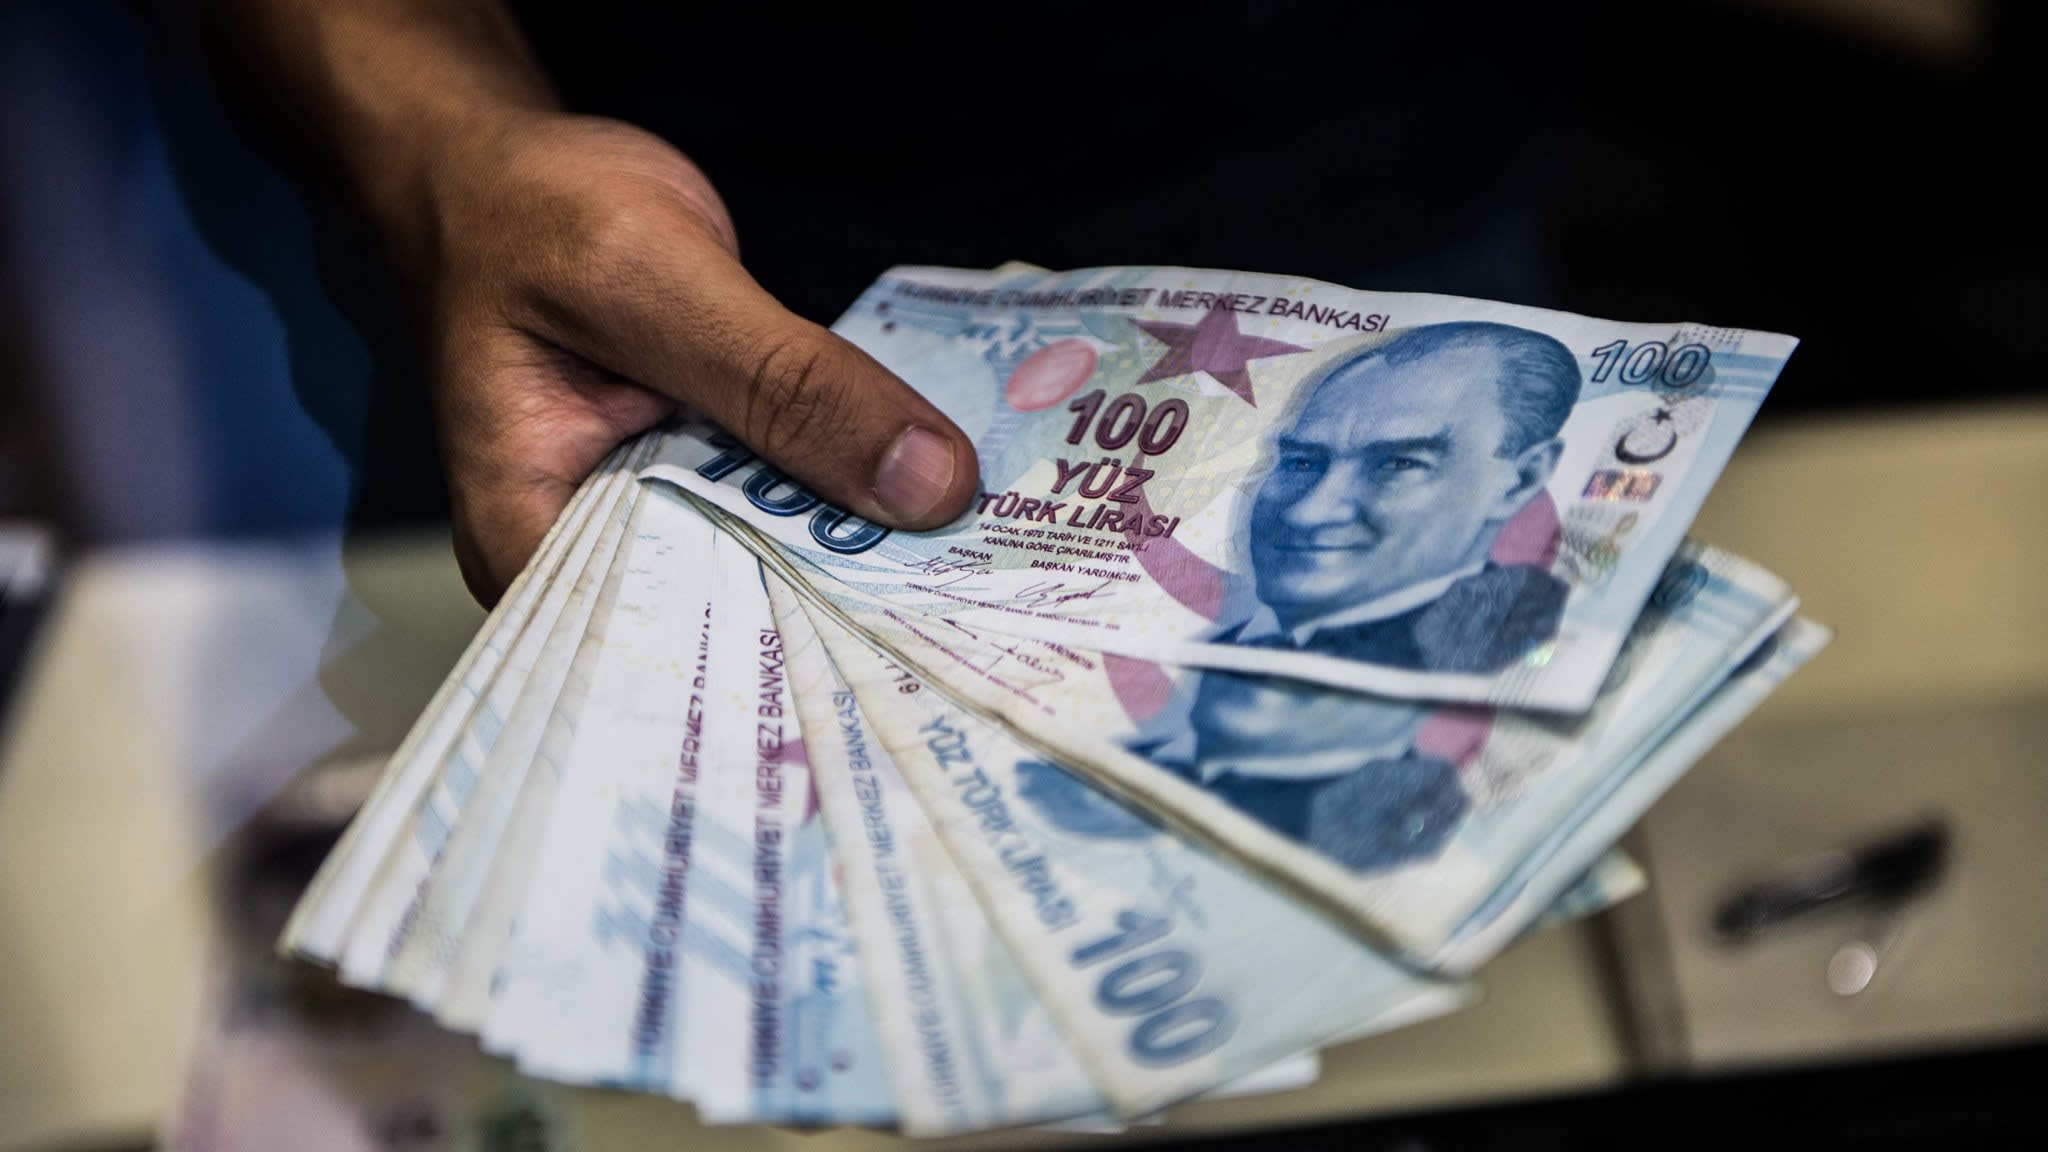 Investors track lira turmoil as mood stays cautious